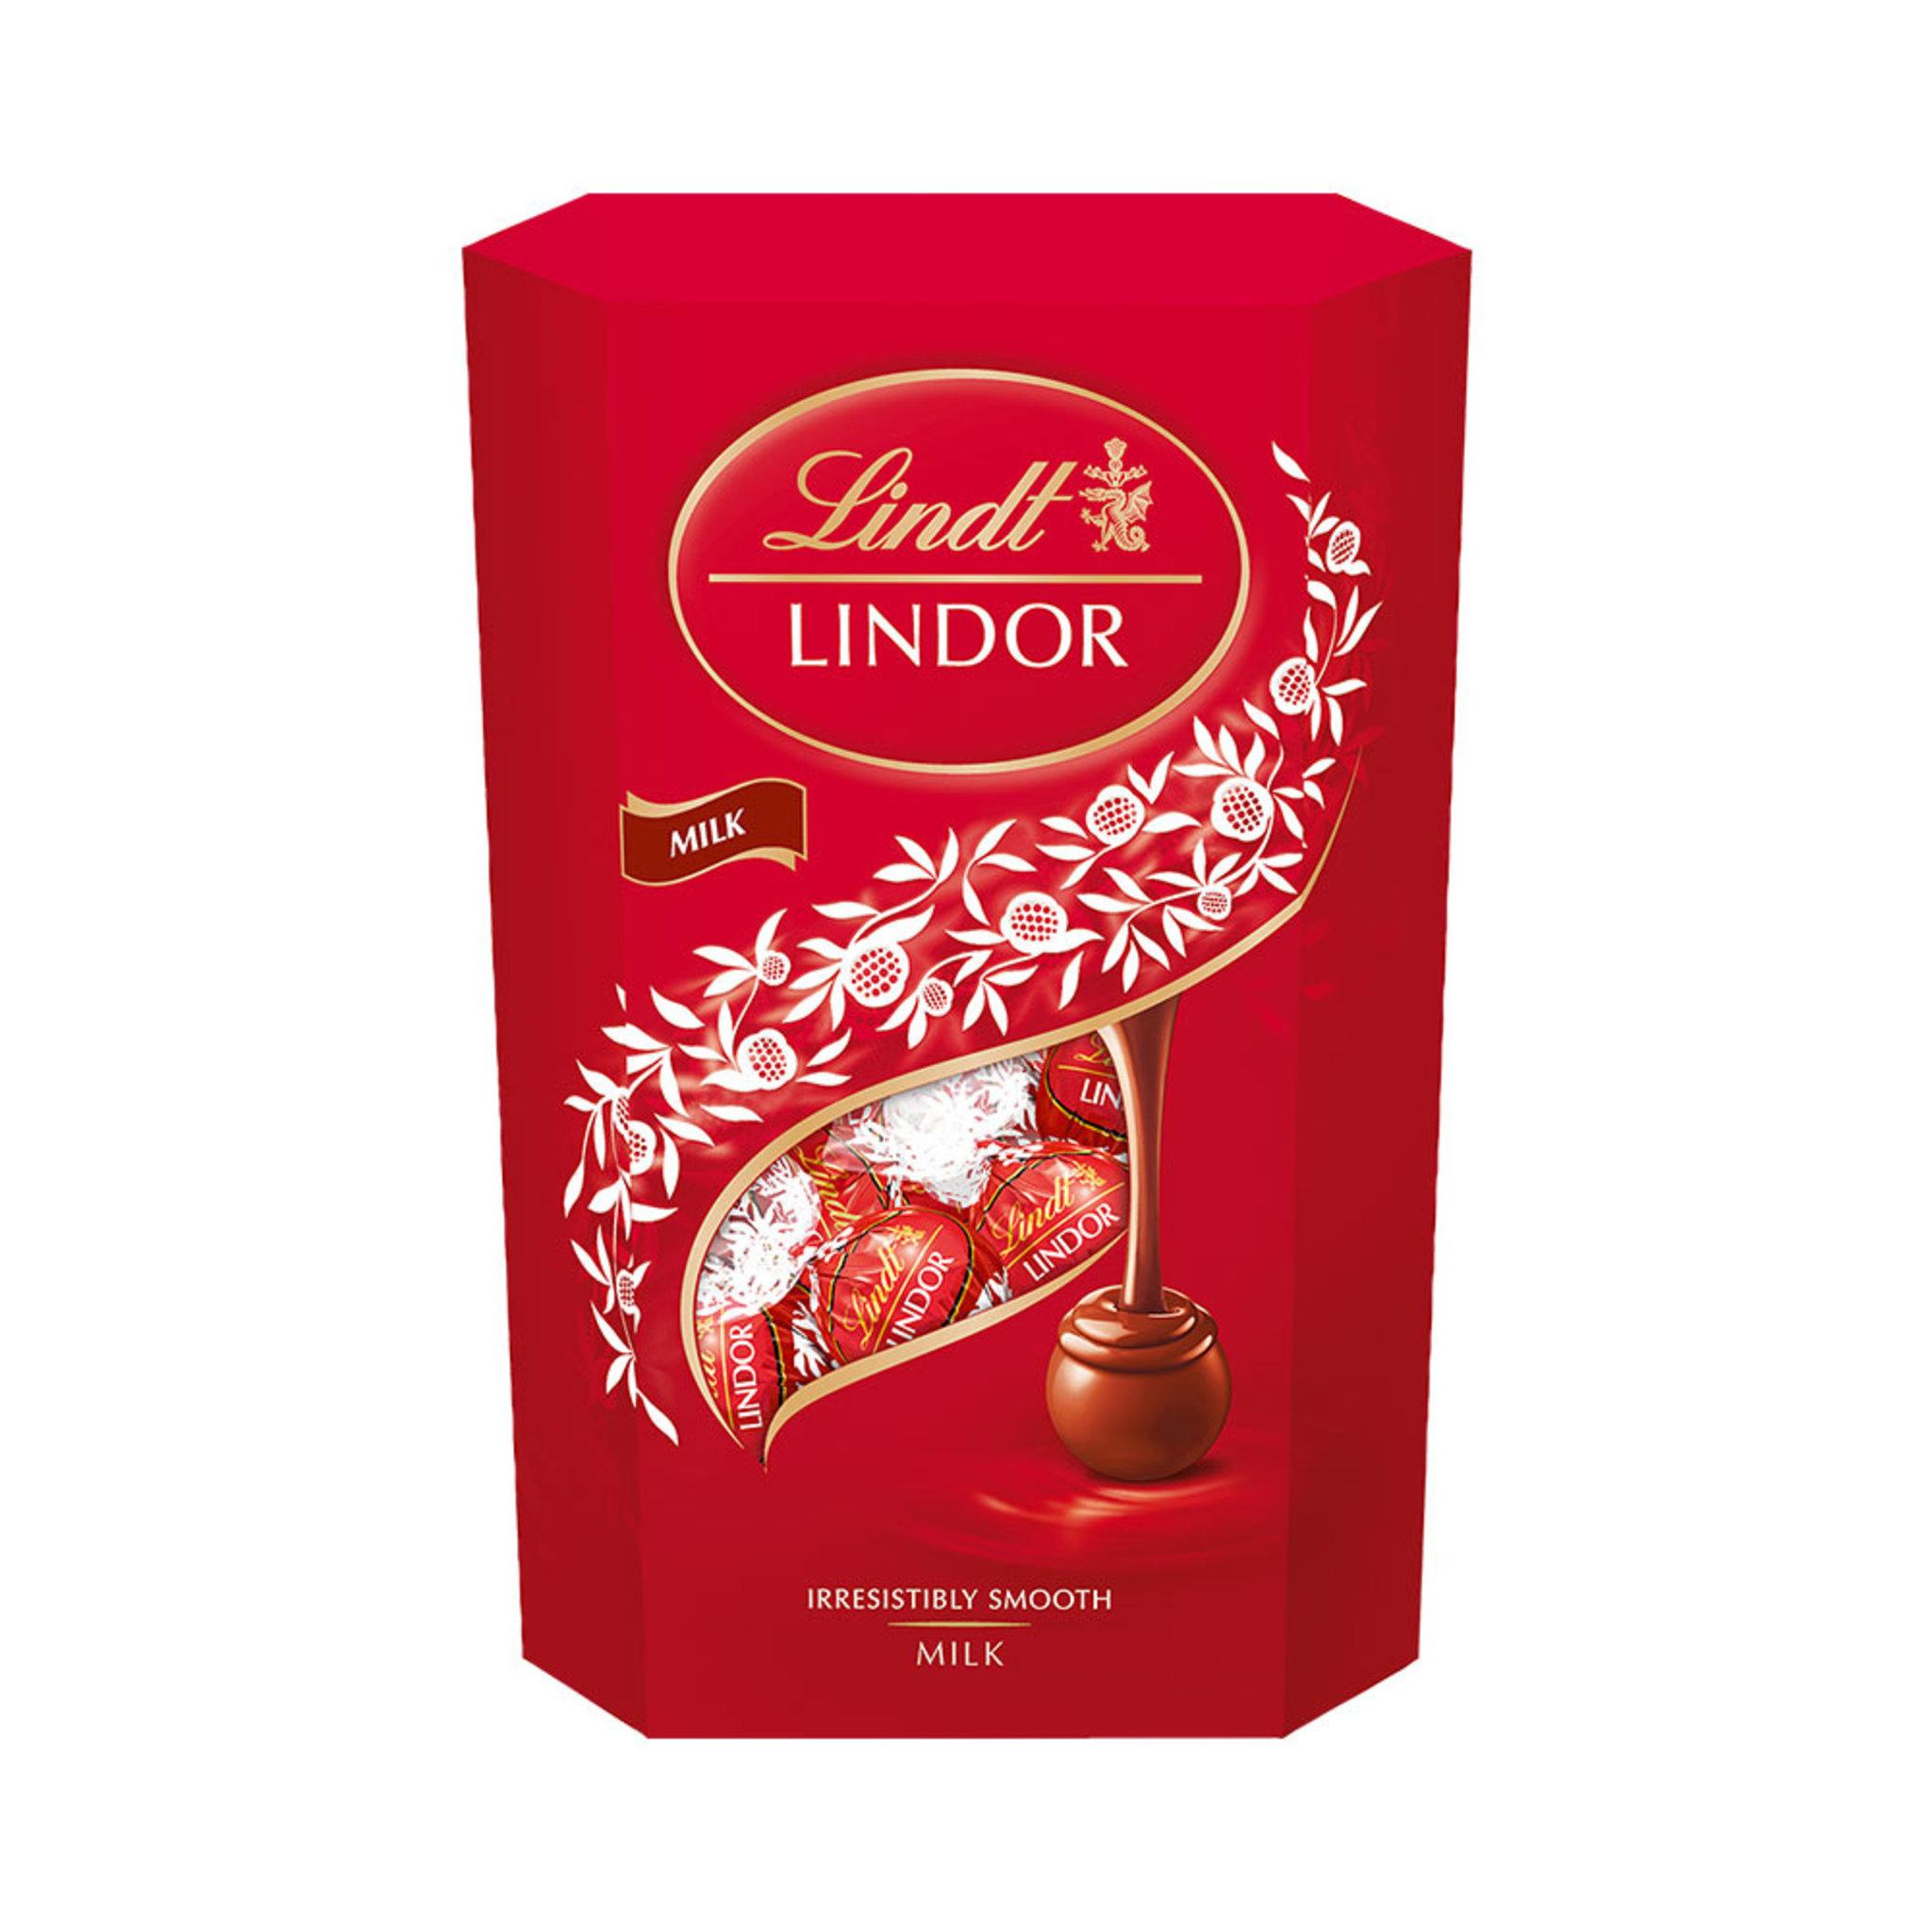 Lindor Milk Cornet 500g